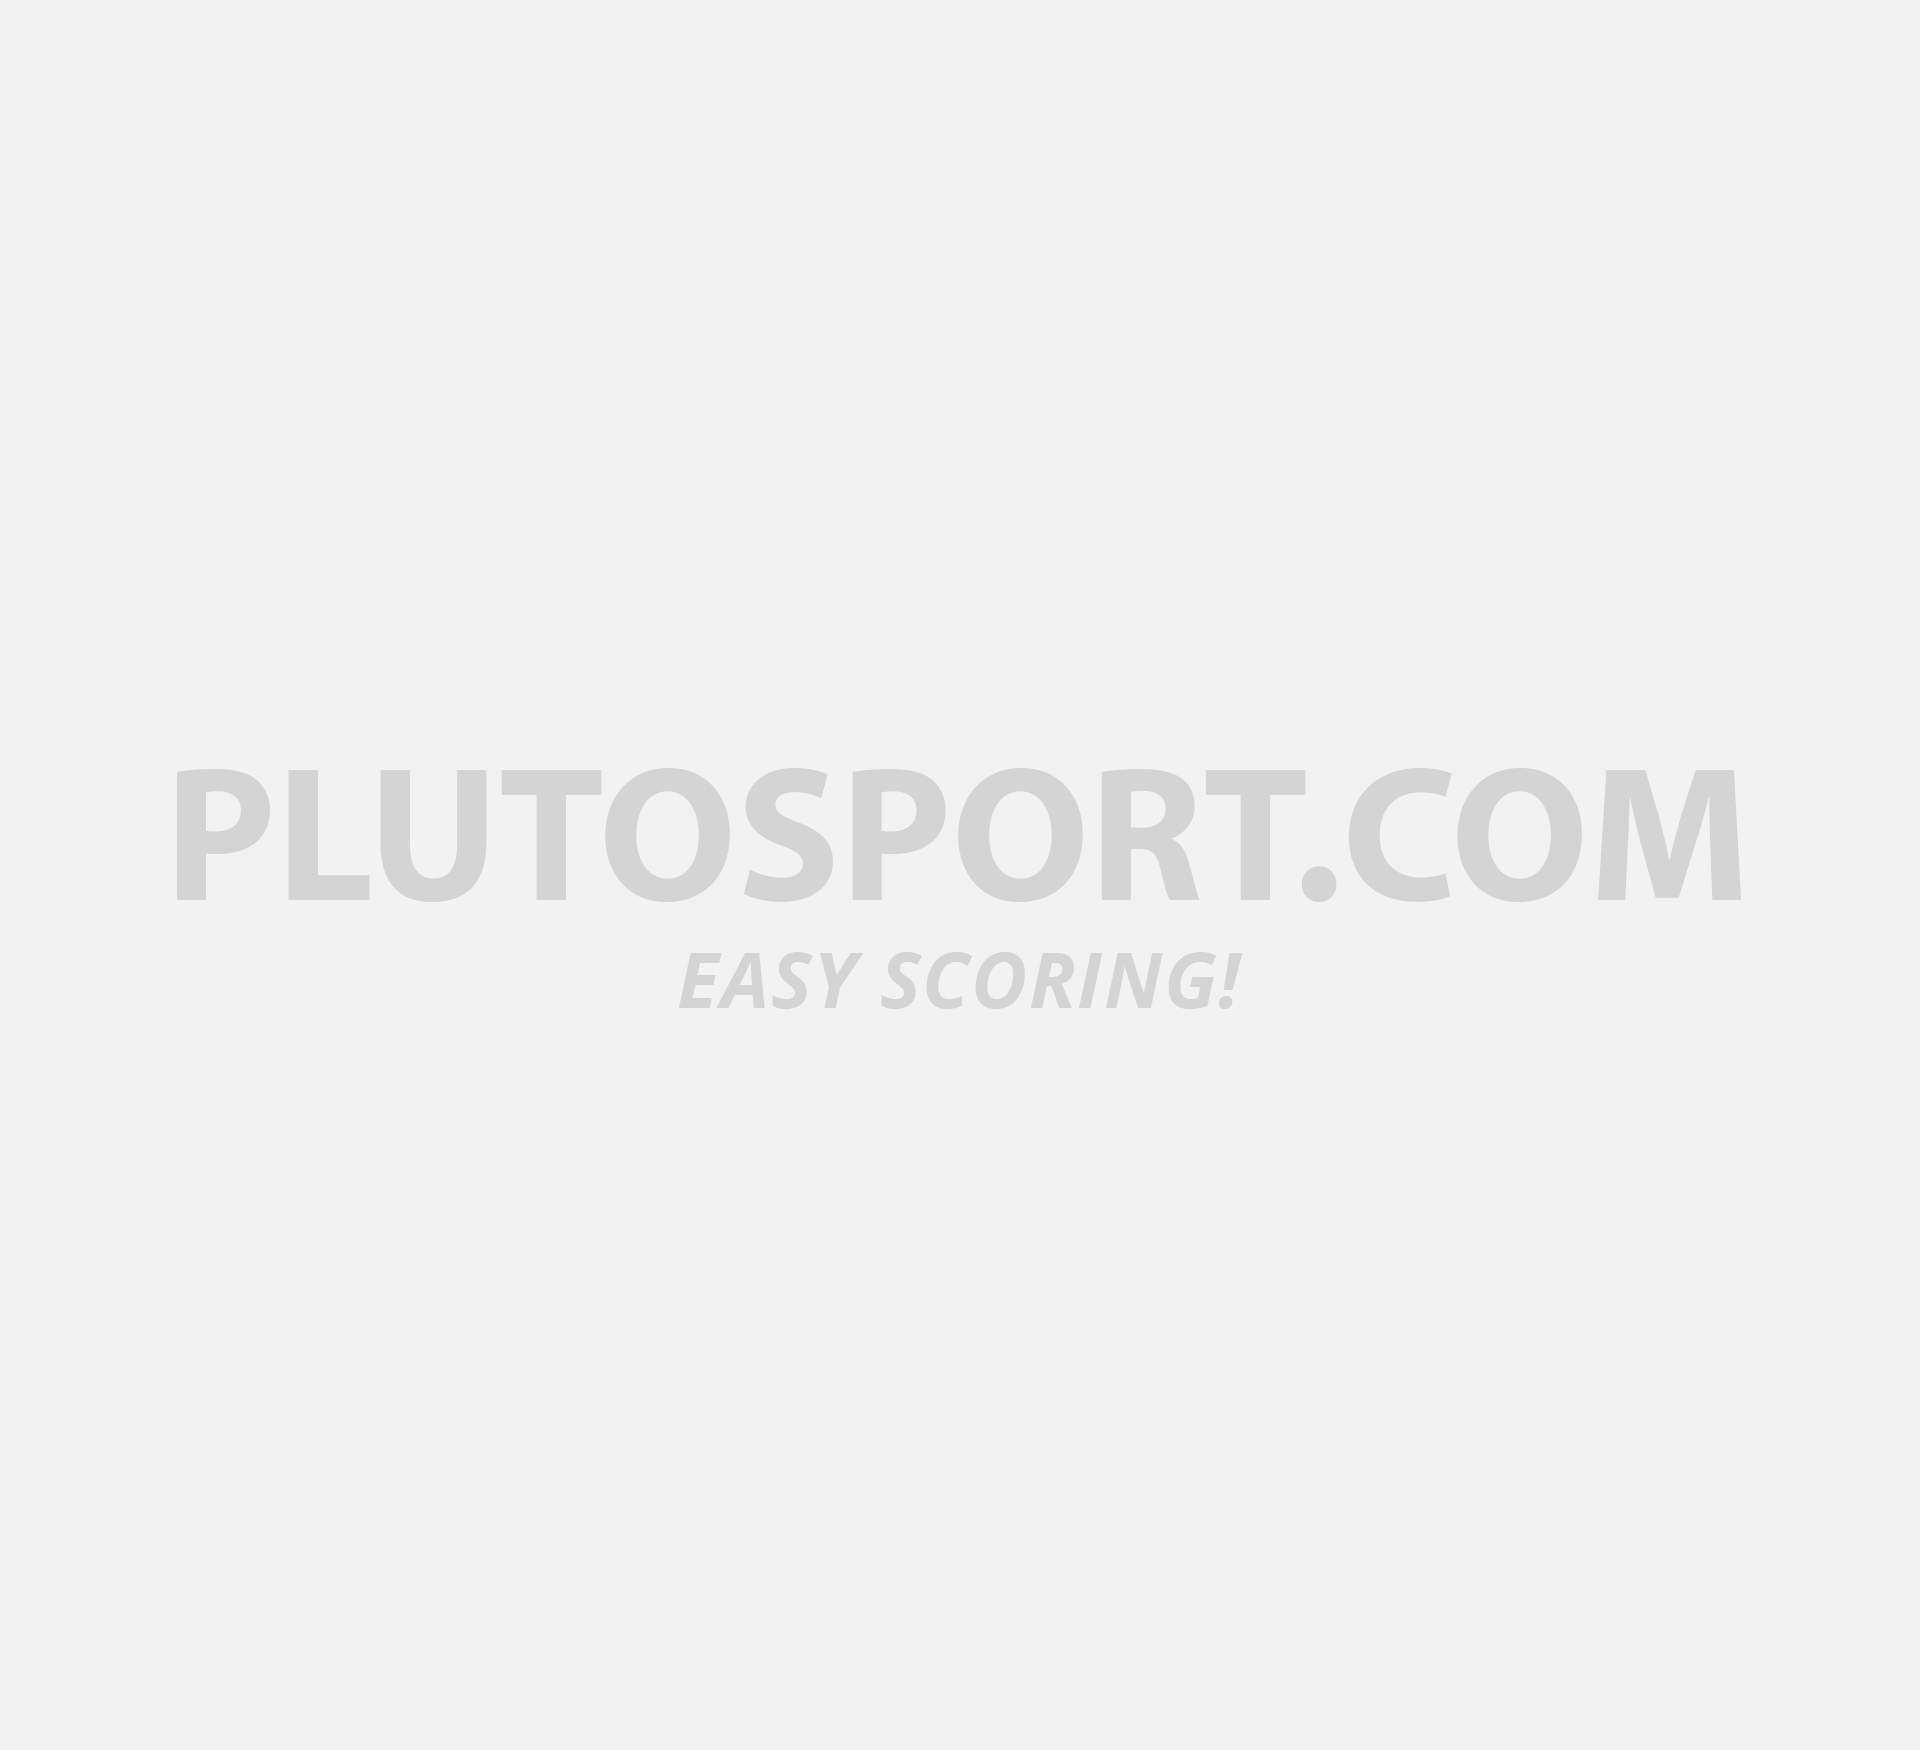 283963b59e421 Adidas Messi 15.4 TF J - Sneakers - Shoes - Lifestyle - Sports ...